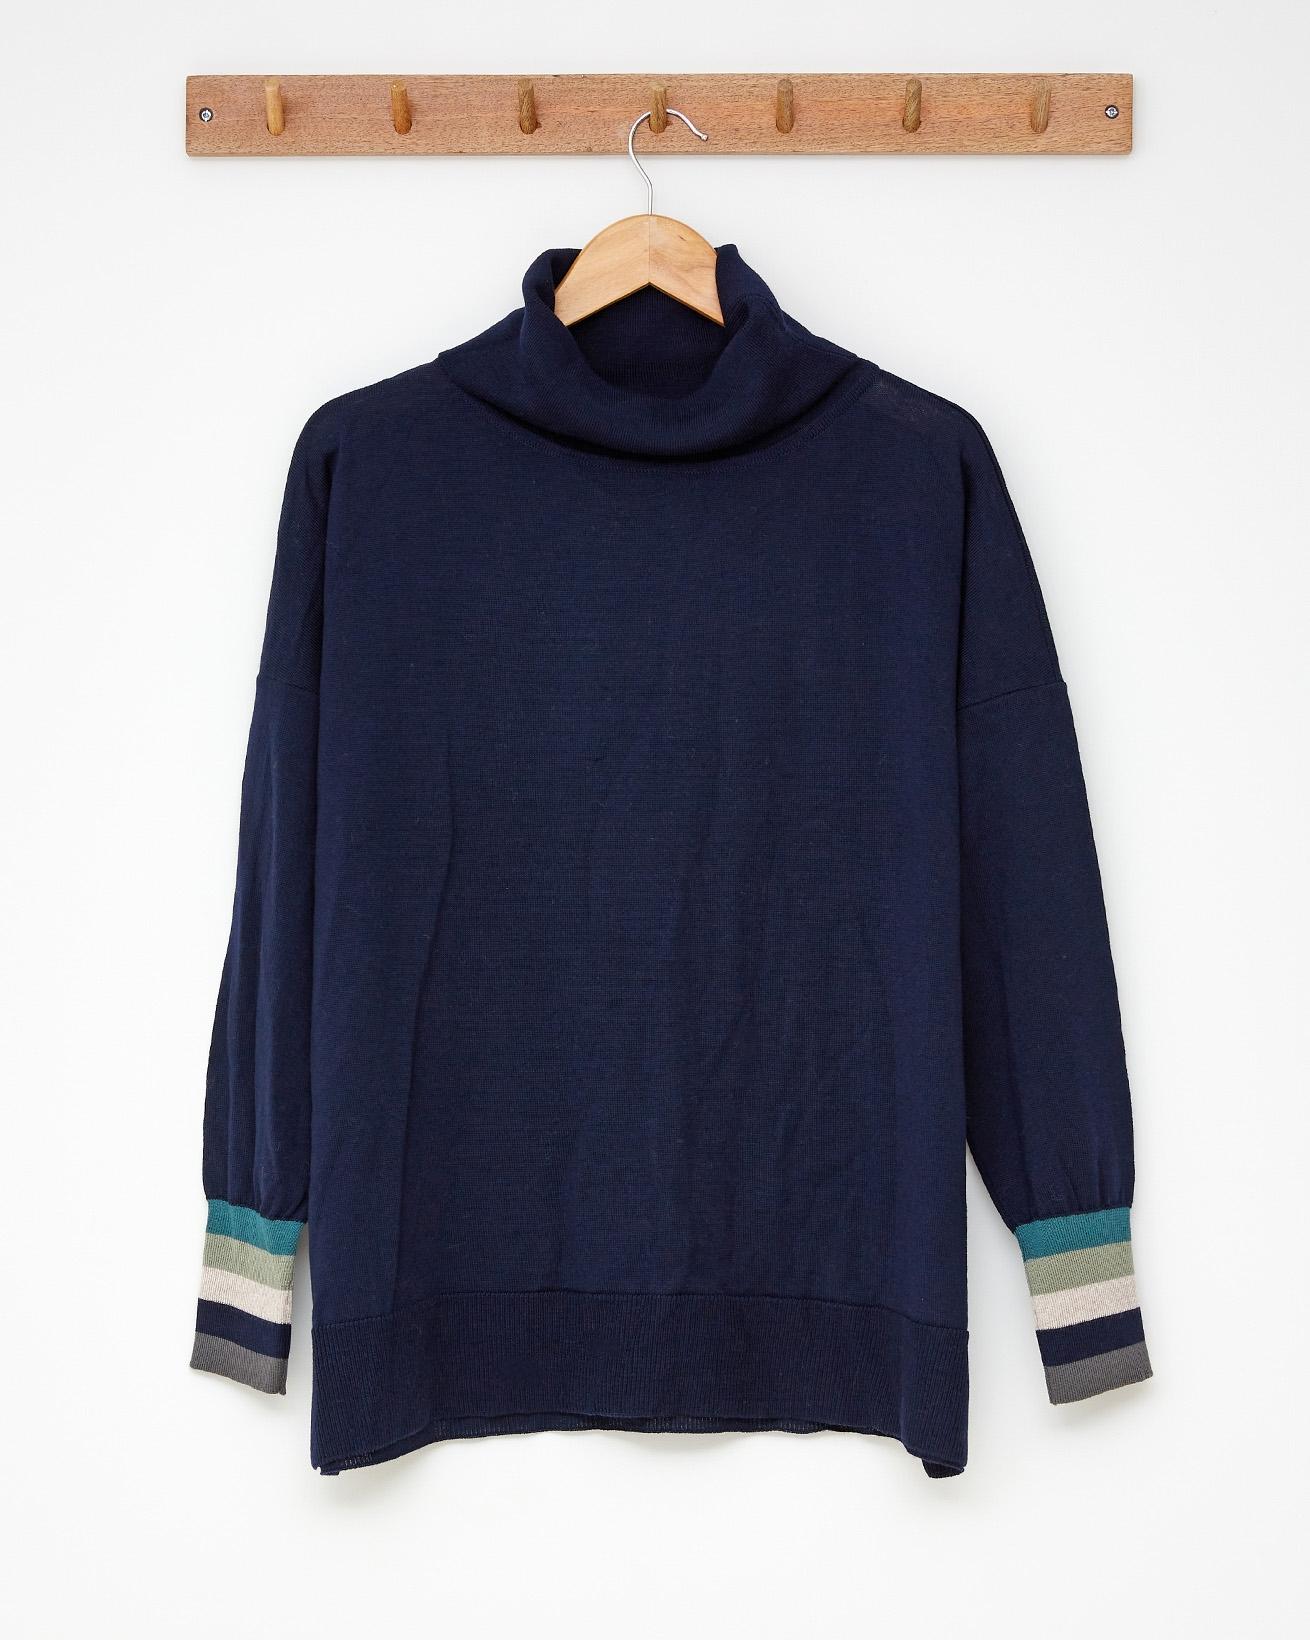 Slouchy fine knit roll neck - Size Small - Dark navy, multi - 2517